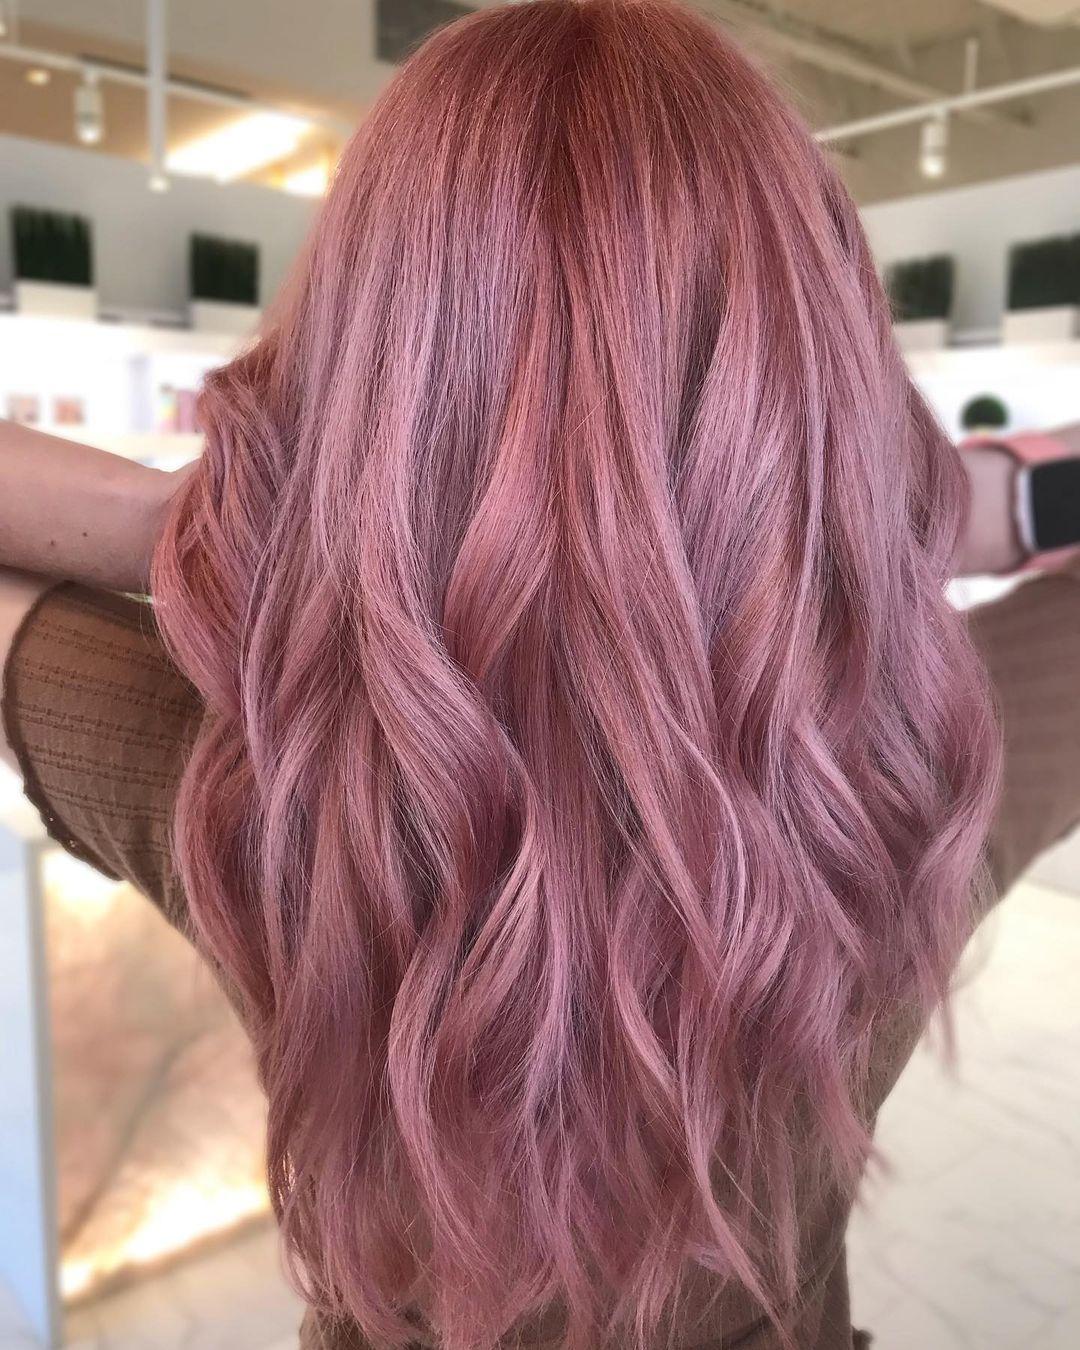 Waist-Length, Pastel Pink Waves